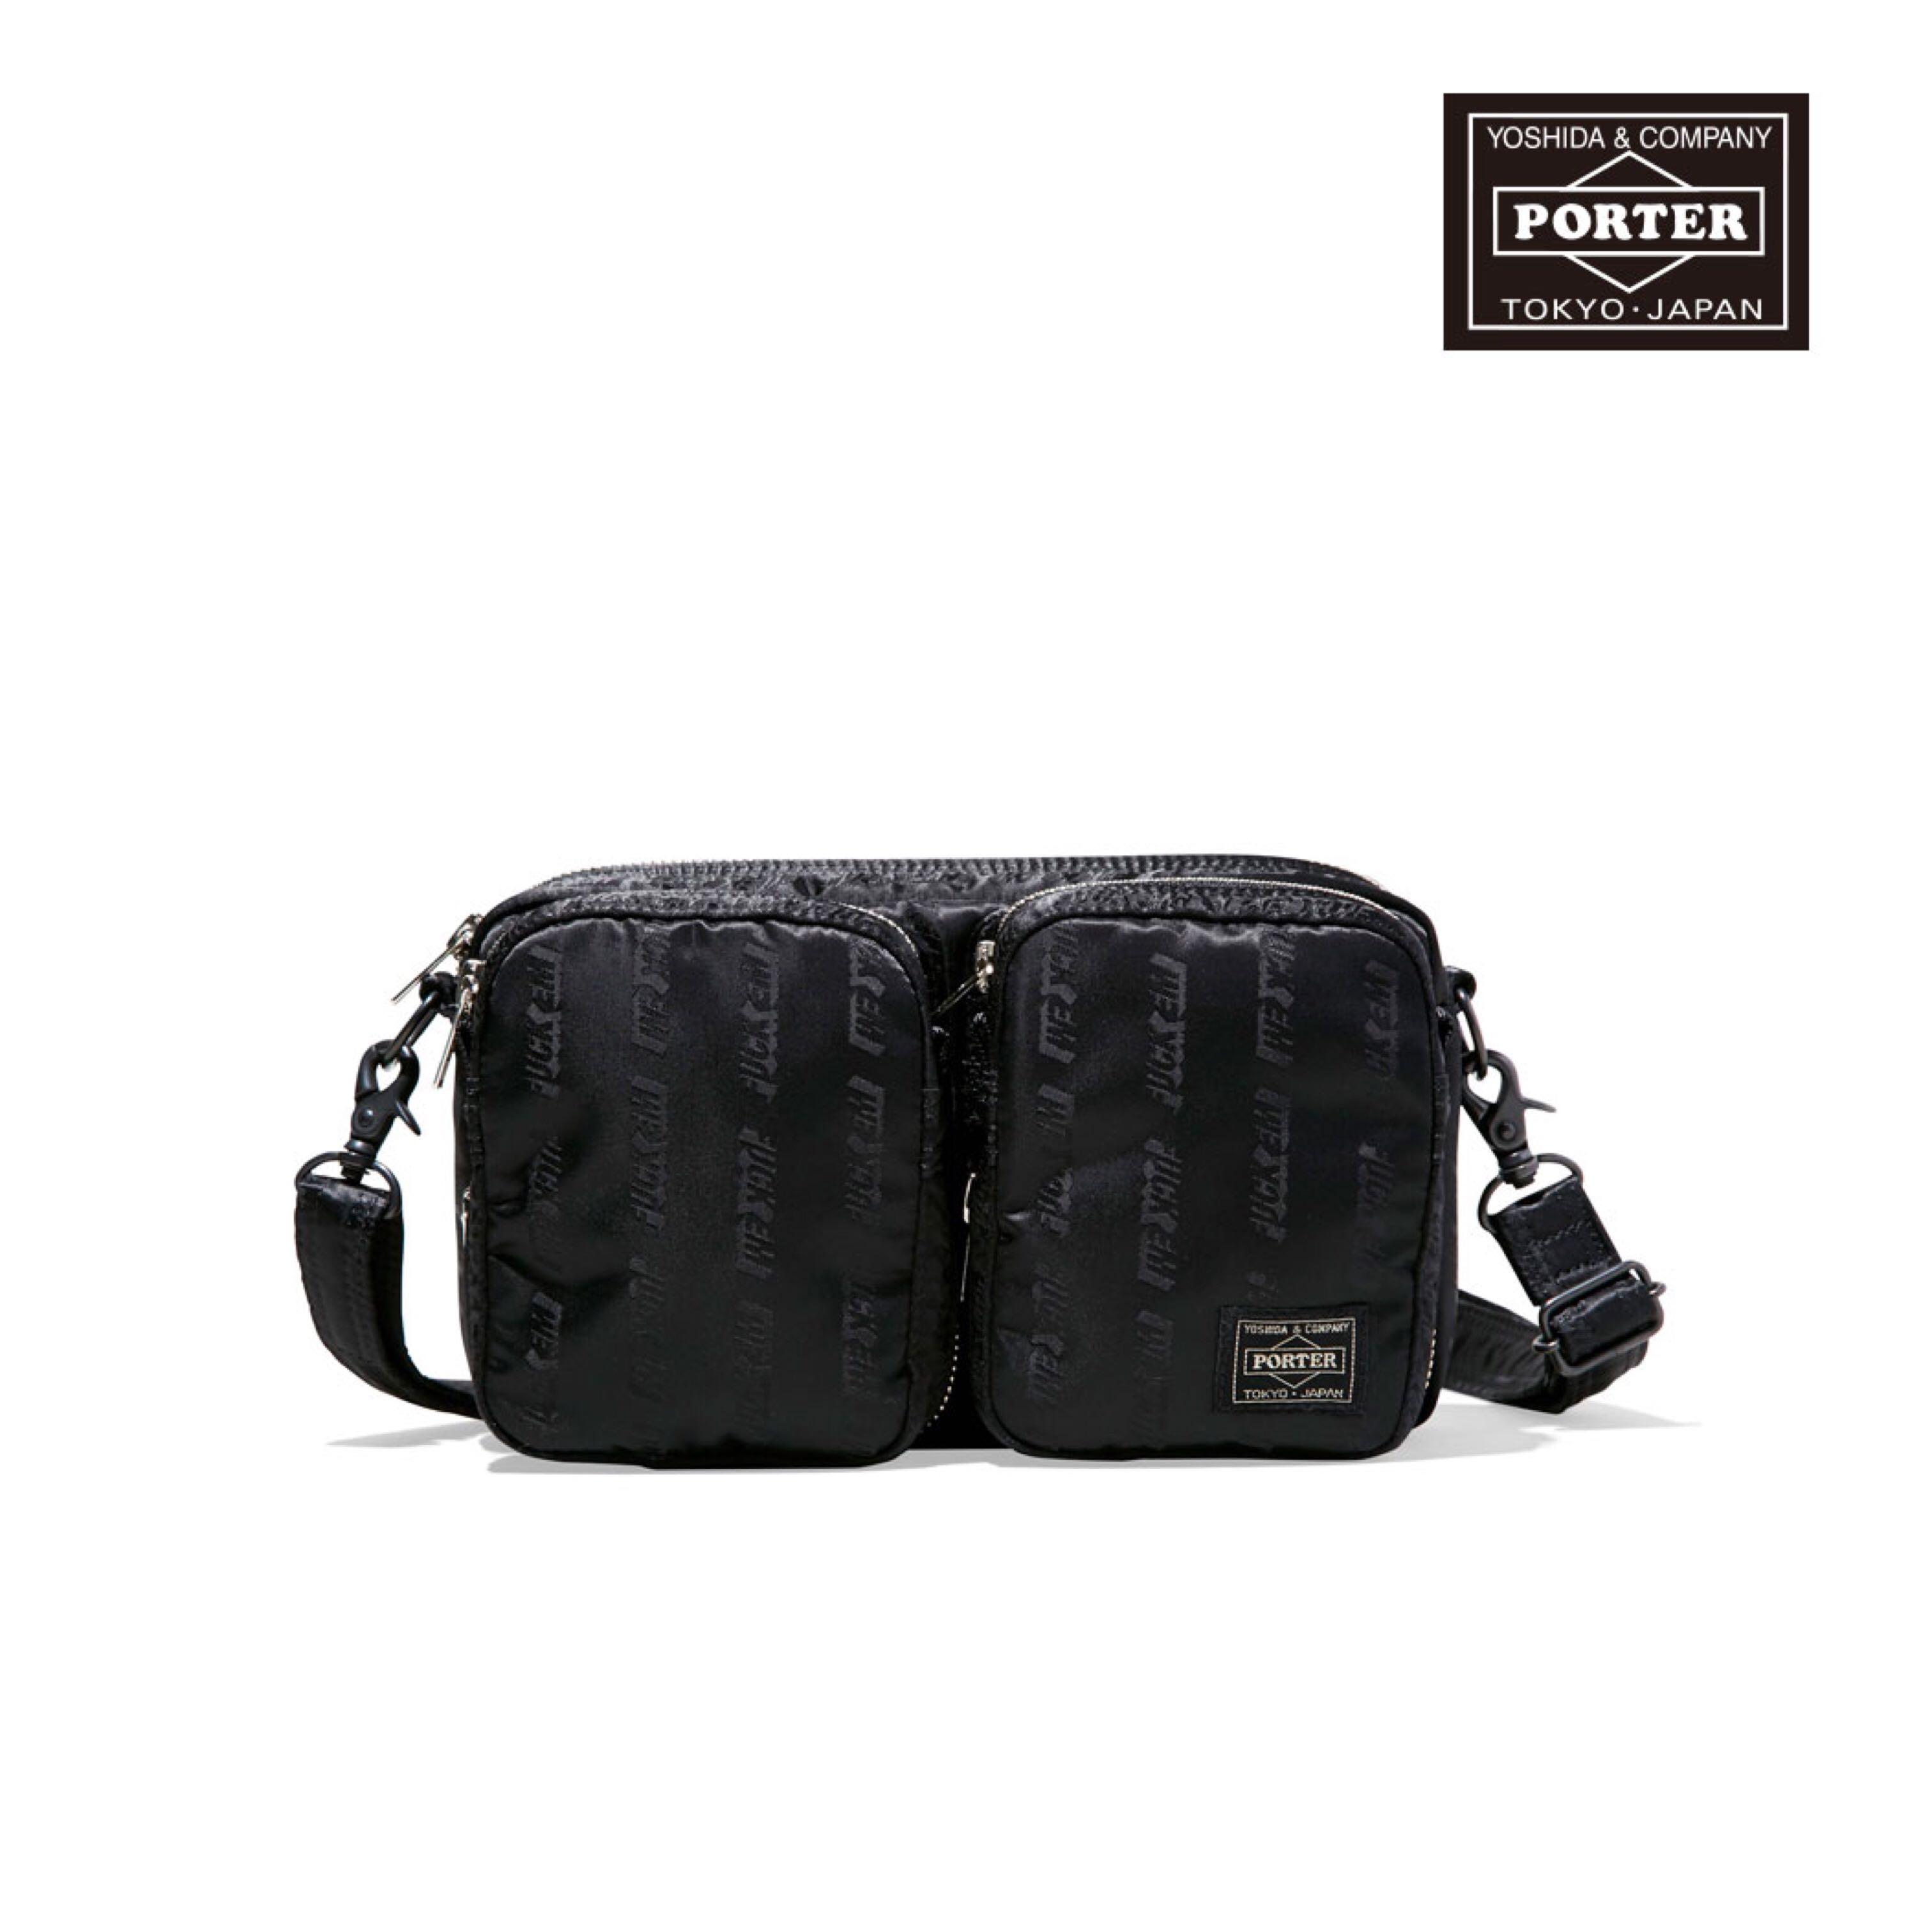 Home · Men s Fashion · Bags   Wallets · Sling Bags. photo photo photo photo b49a86daf759e